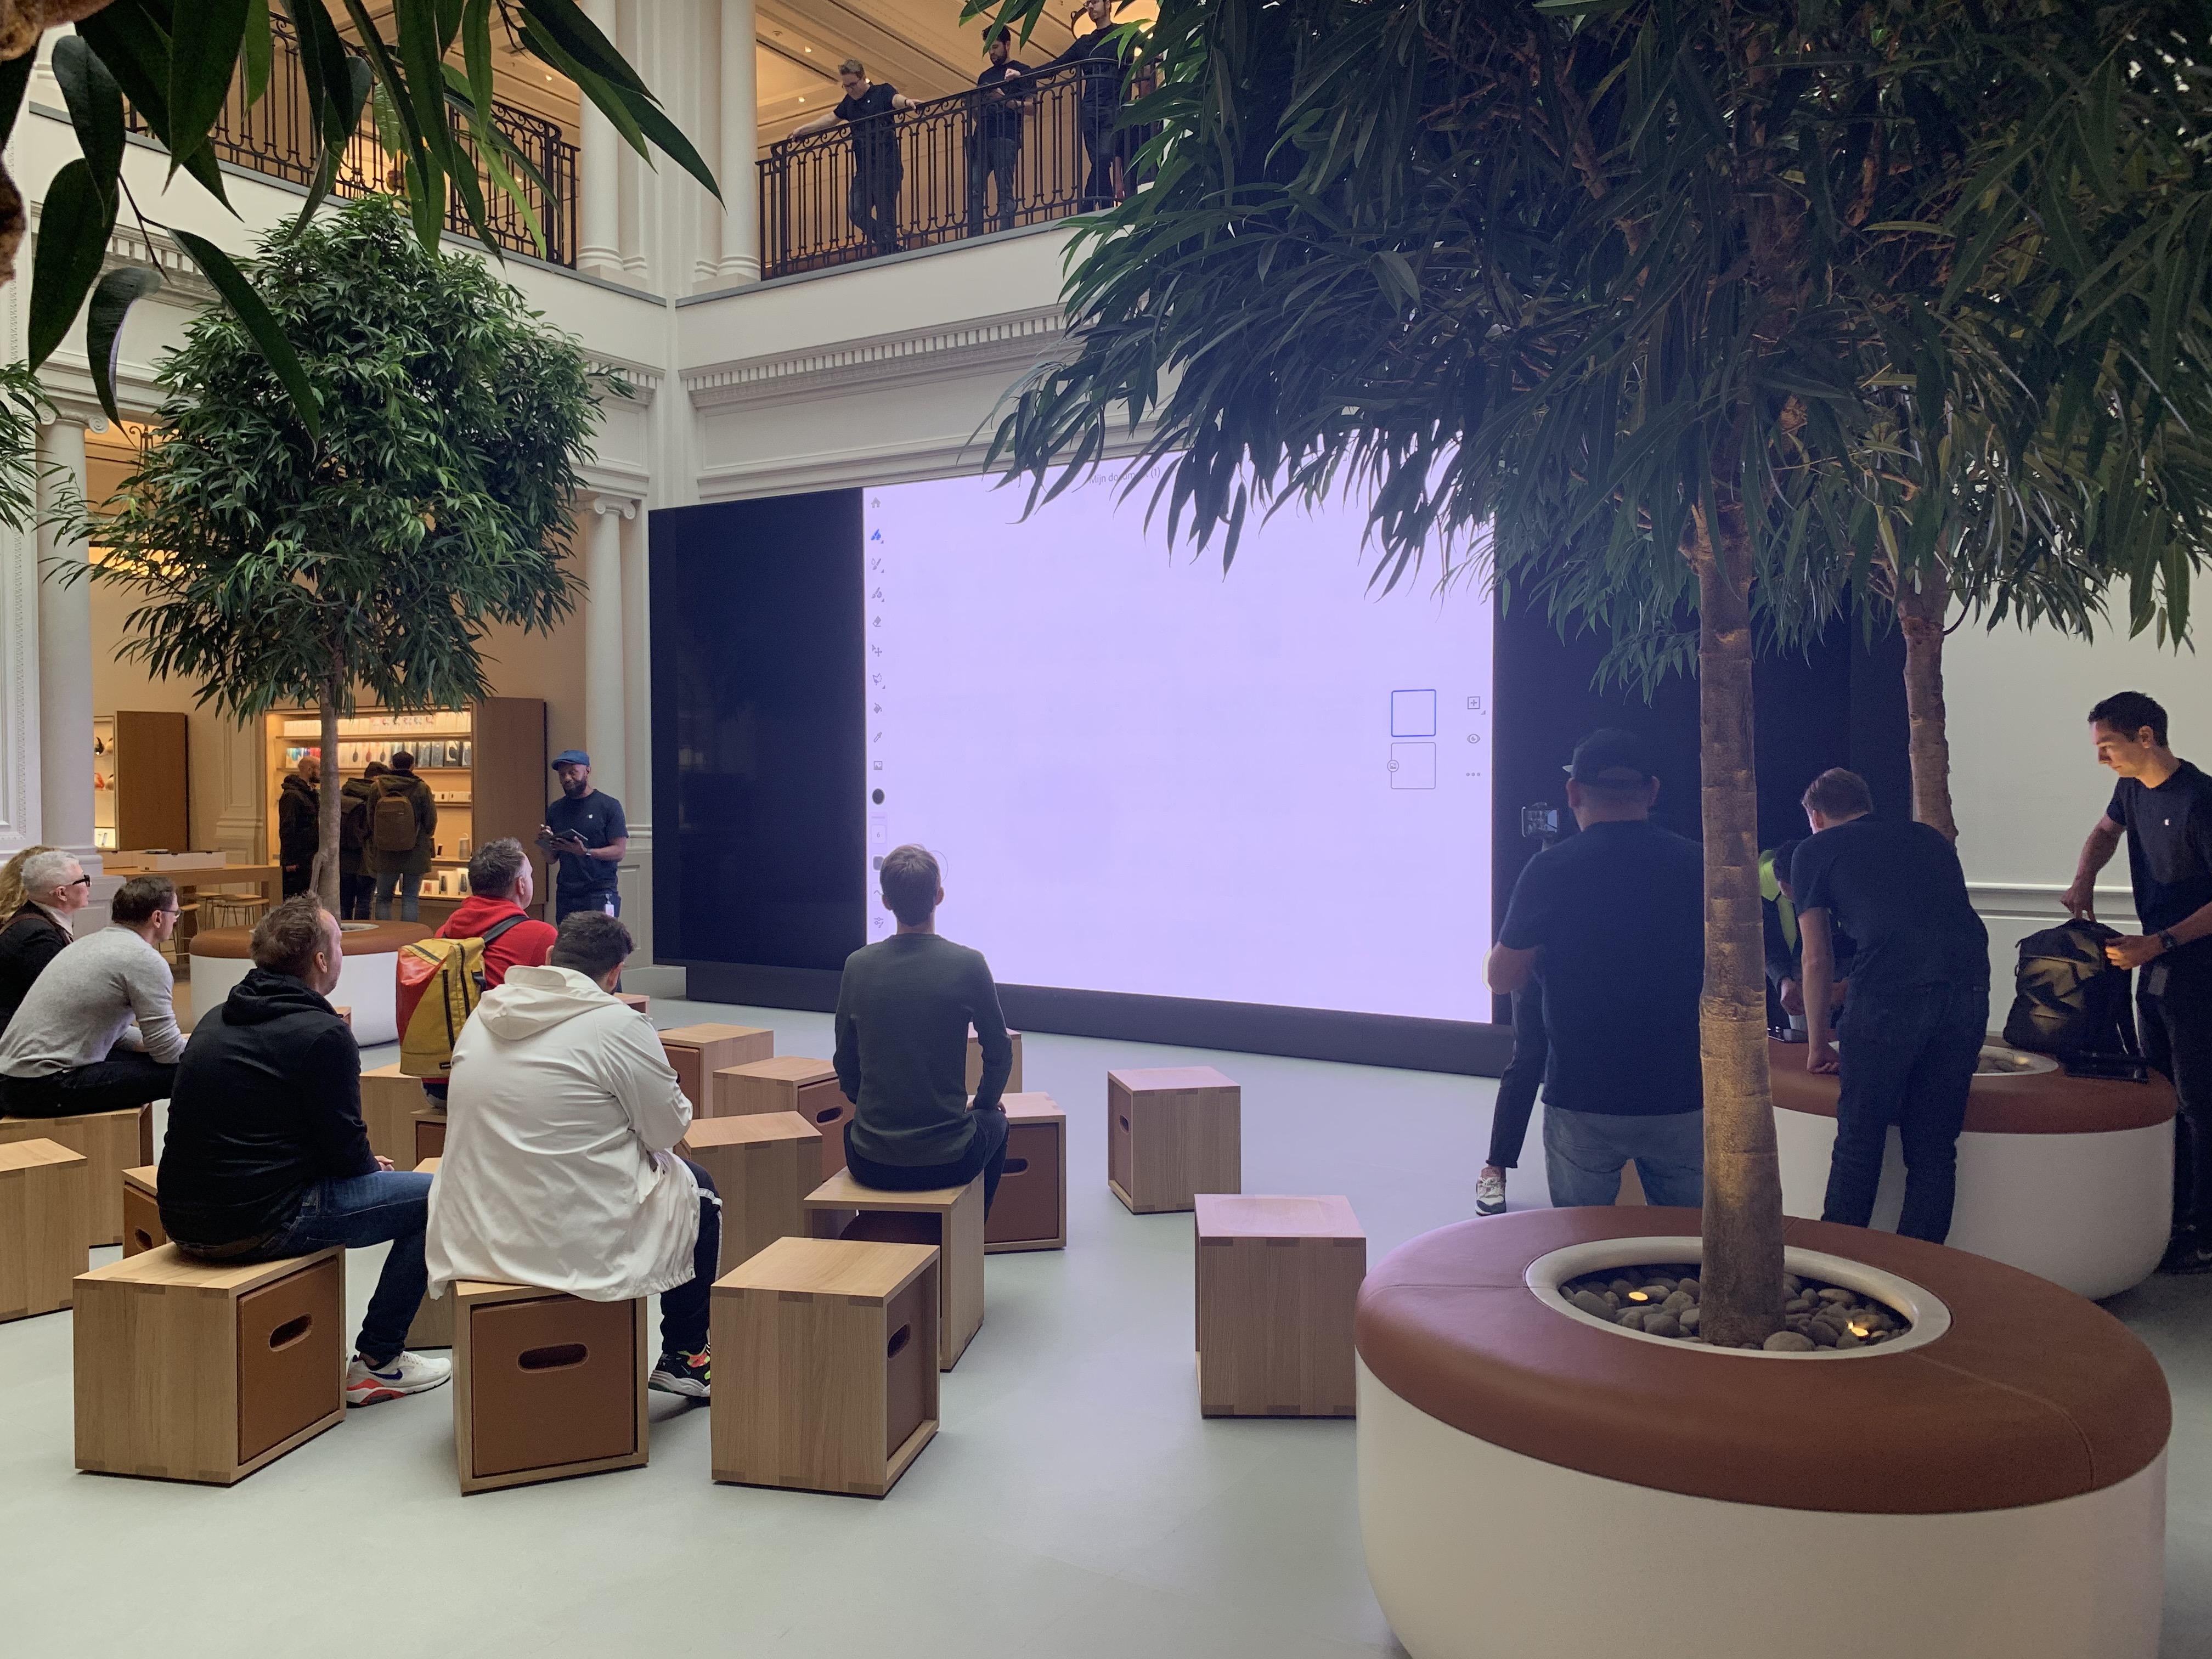 Apple Store Amsterdam heropening 2019 - 003